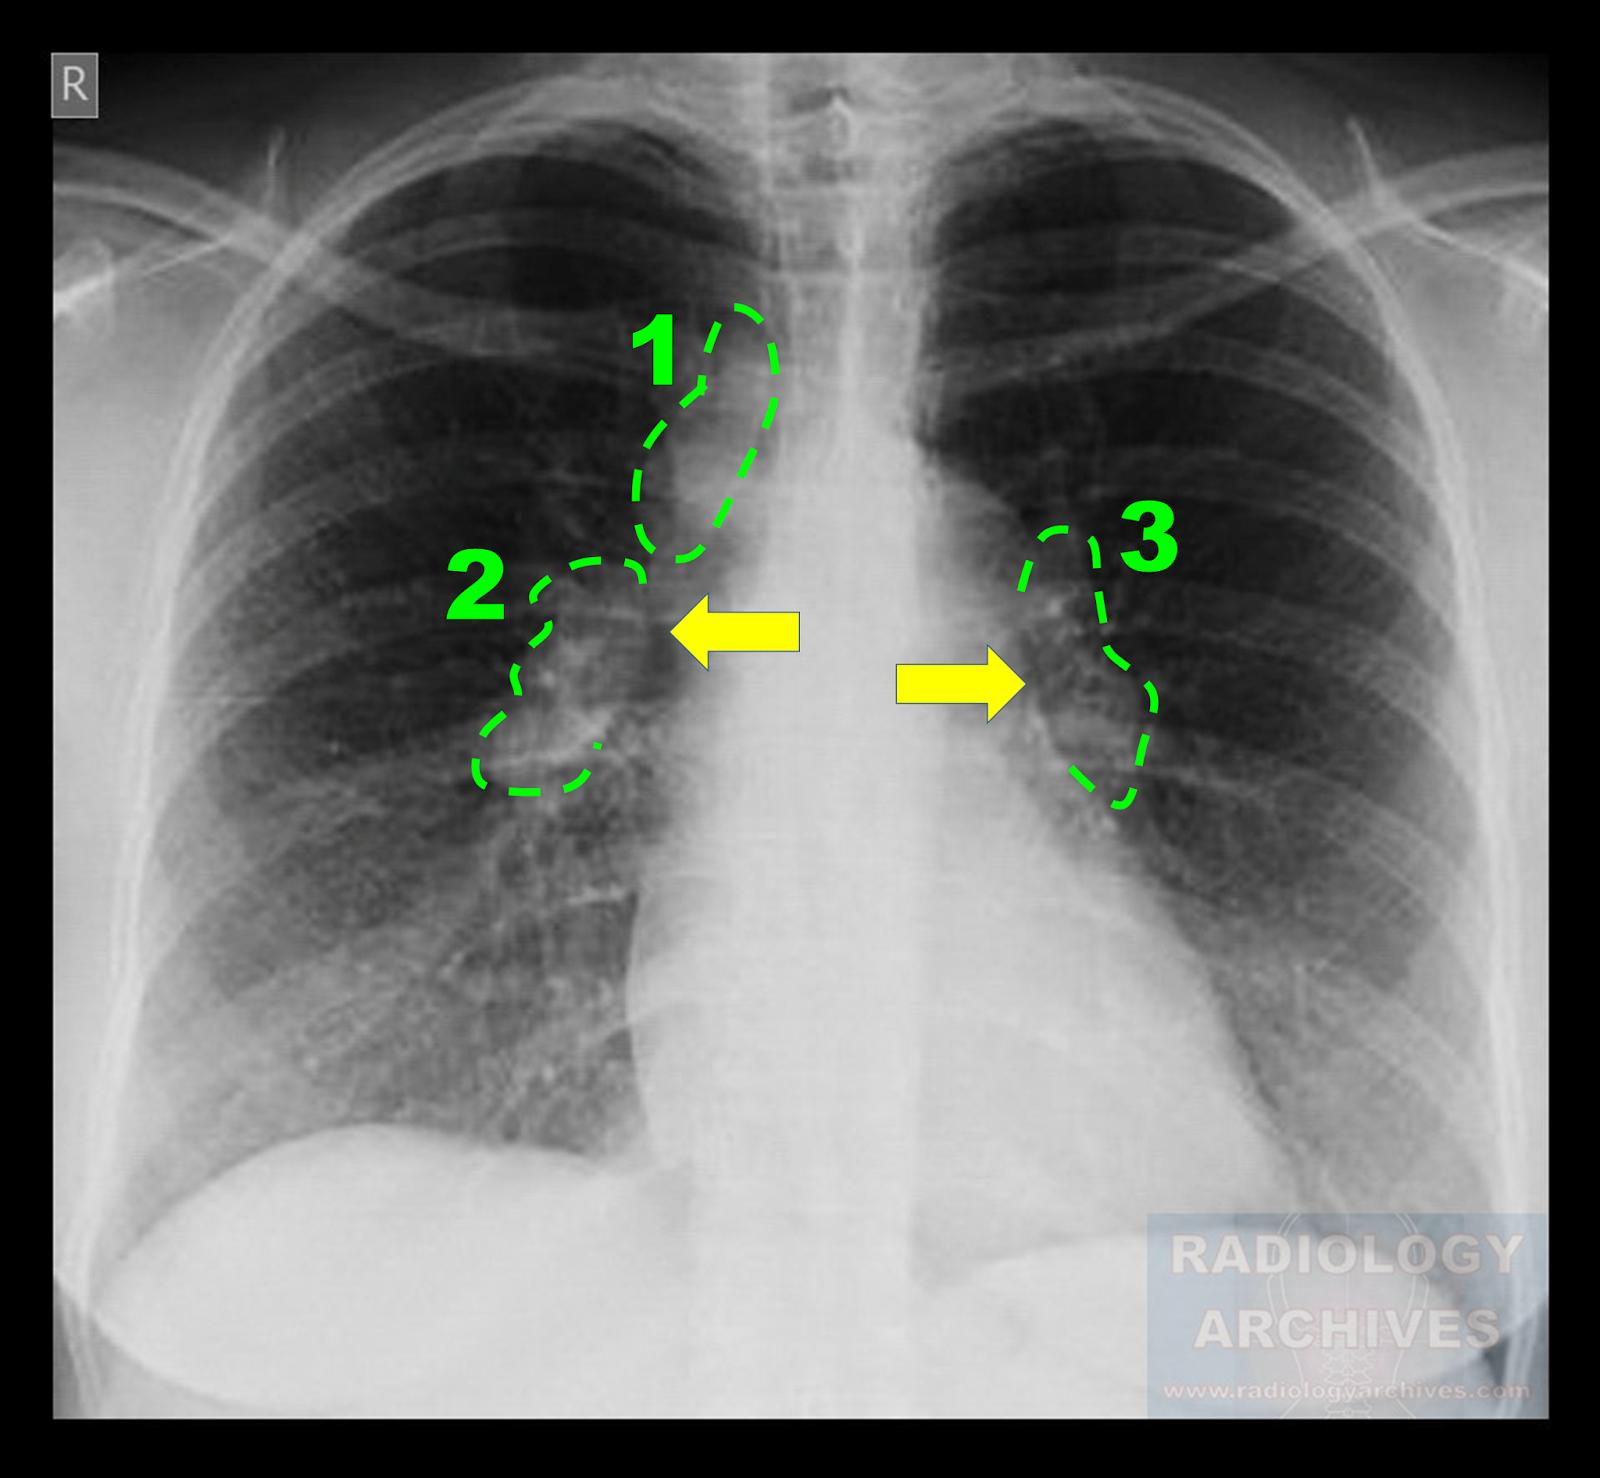 Sarcoidosis Stage II (1-2-3 Sign - Garland Triad)